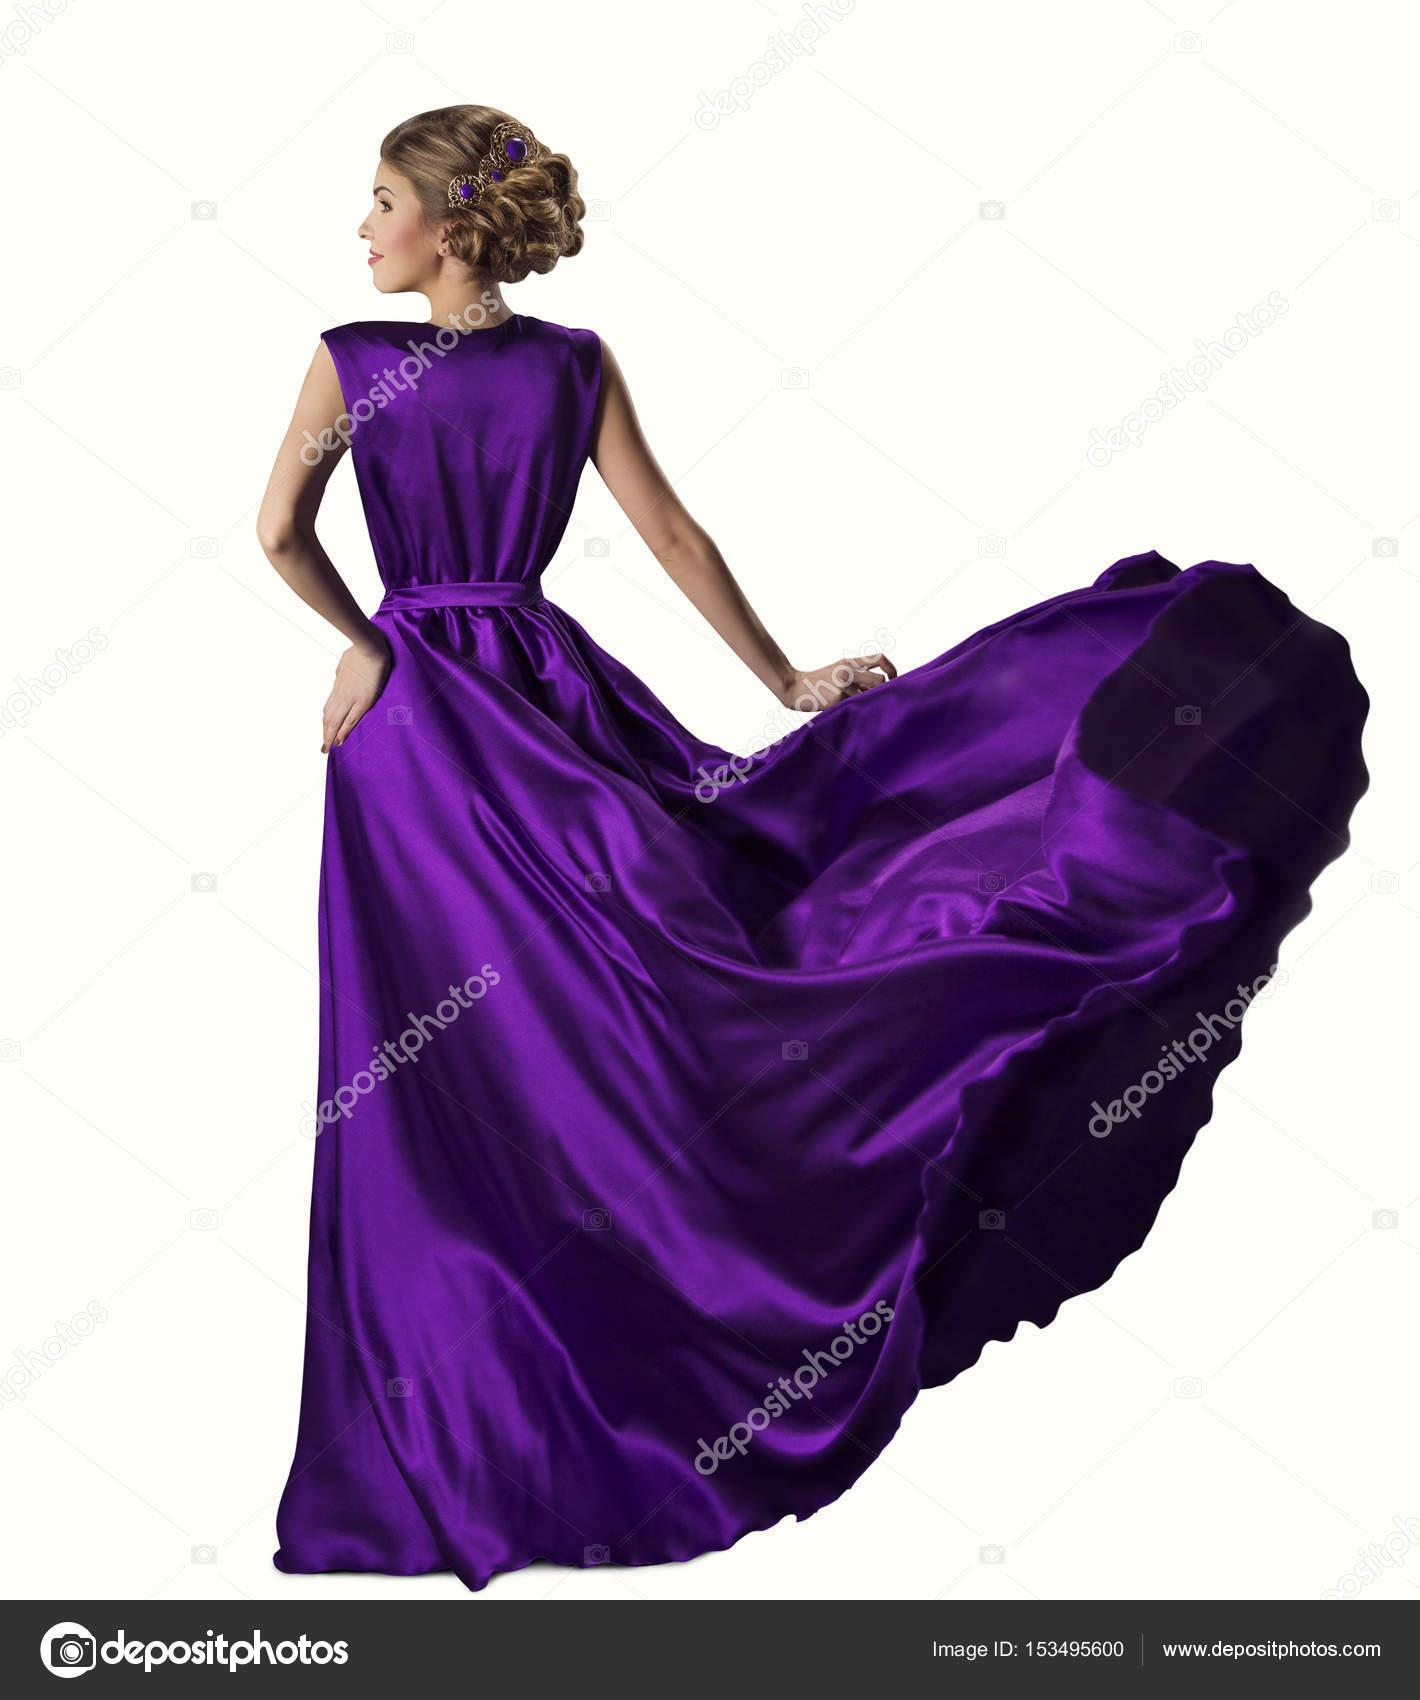 Mujer púrpura vestido, modelo de moda en vestido de seda, que agita ...